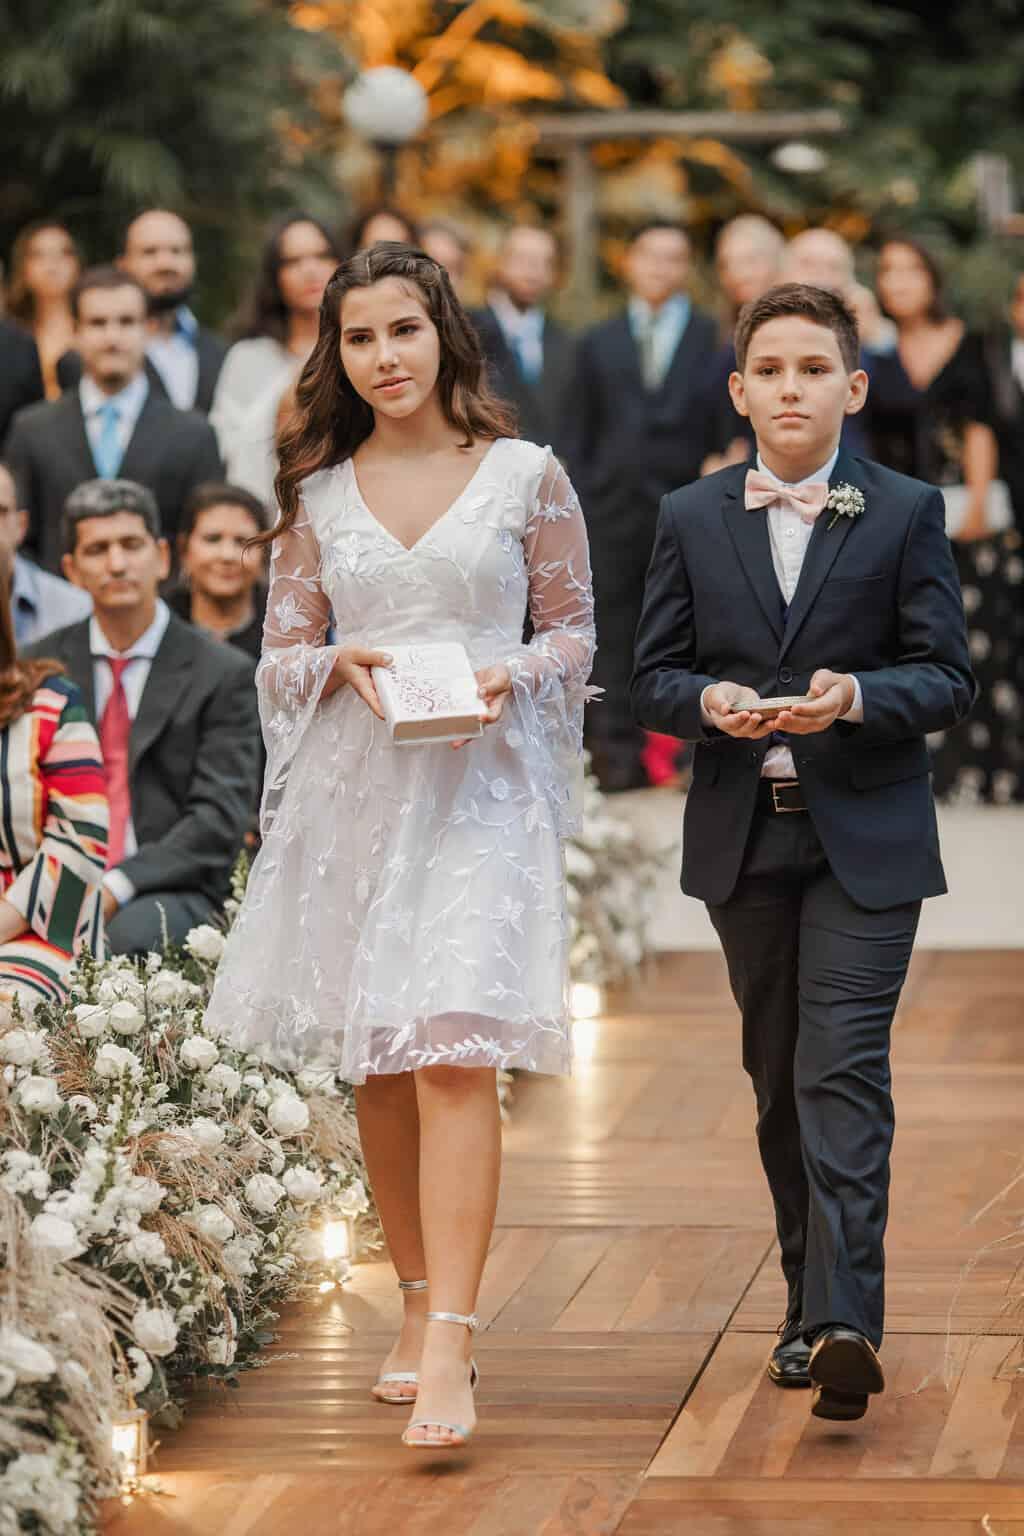 casamento-Beatriz-e-Joao-Fernando-cerimonia-ao-ar-livre-daminhas-e-pajens-Itaipava-Locanda-Della-Mimosa-Thienny-Tammis163